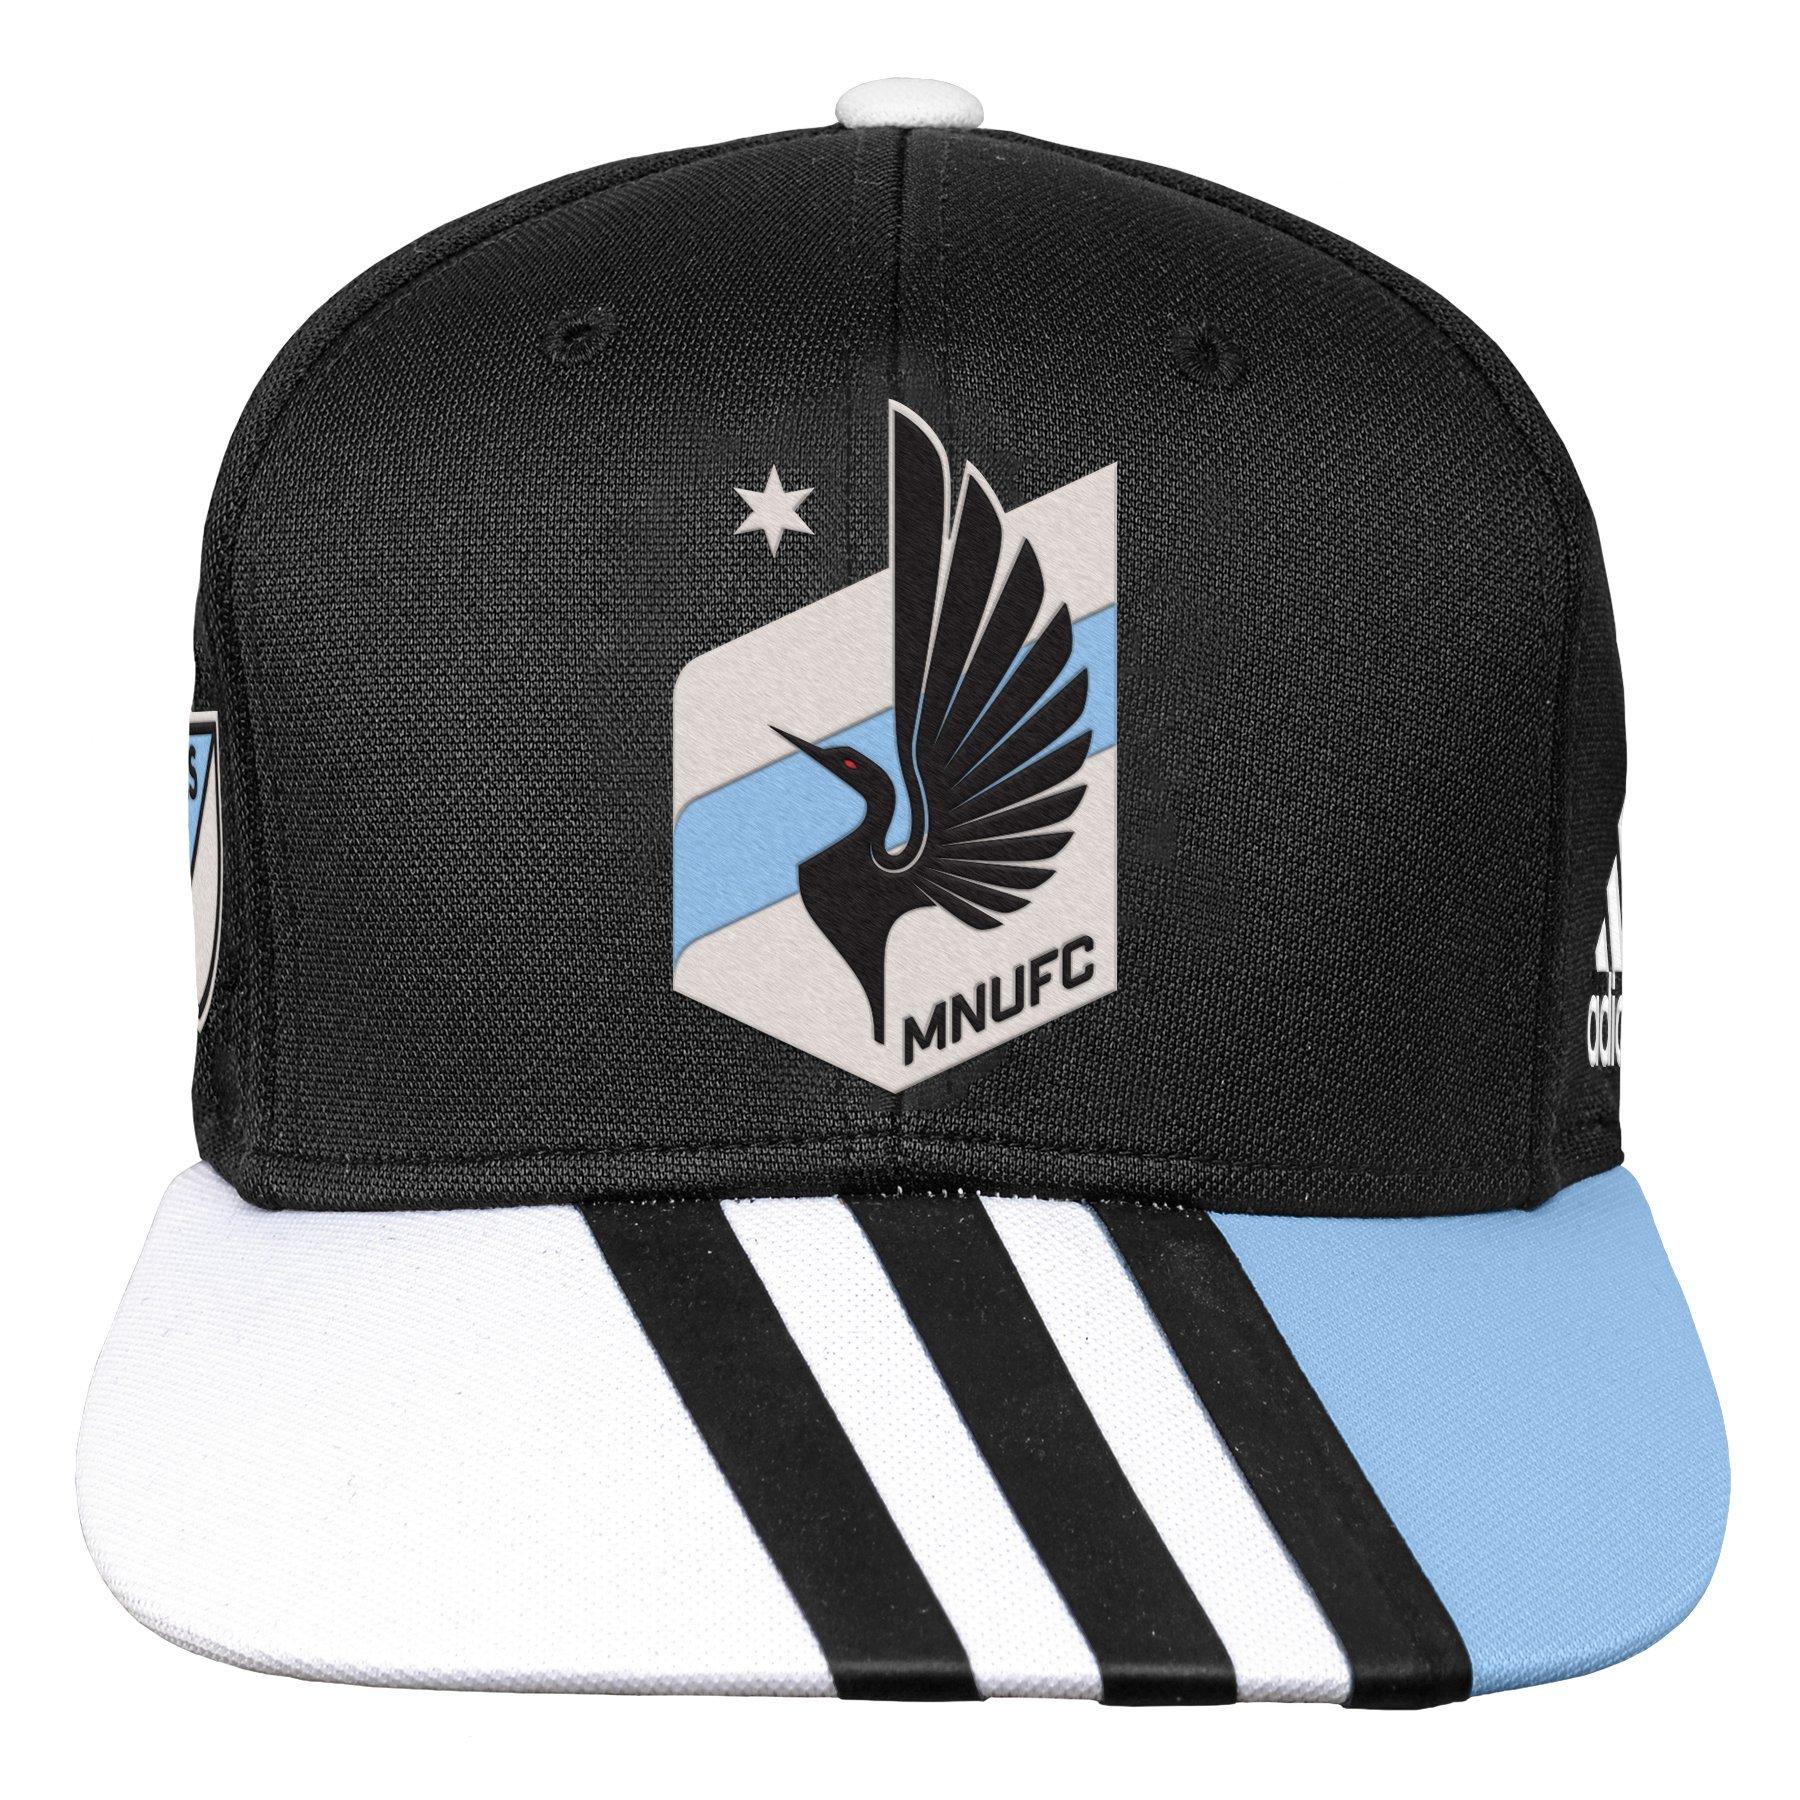 Outerstuff MLS Minnesota United R S8FMK Youth Boys Flatbrim Snapback, One Size (8), Black